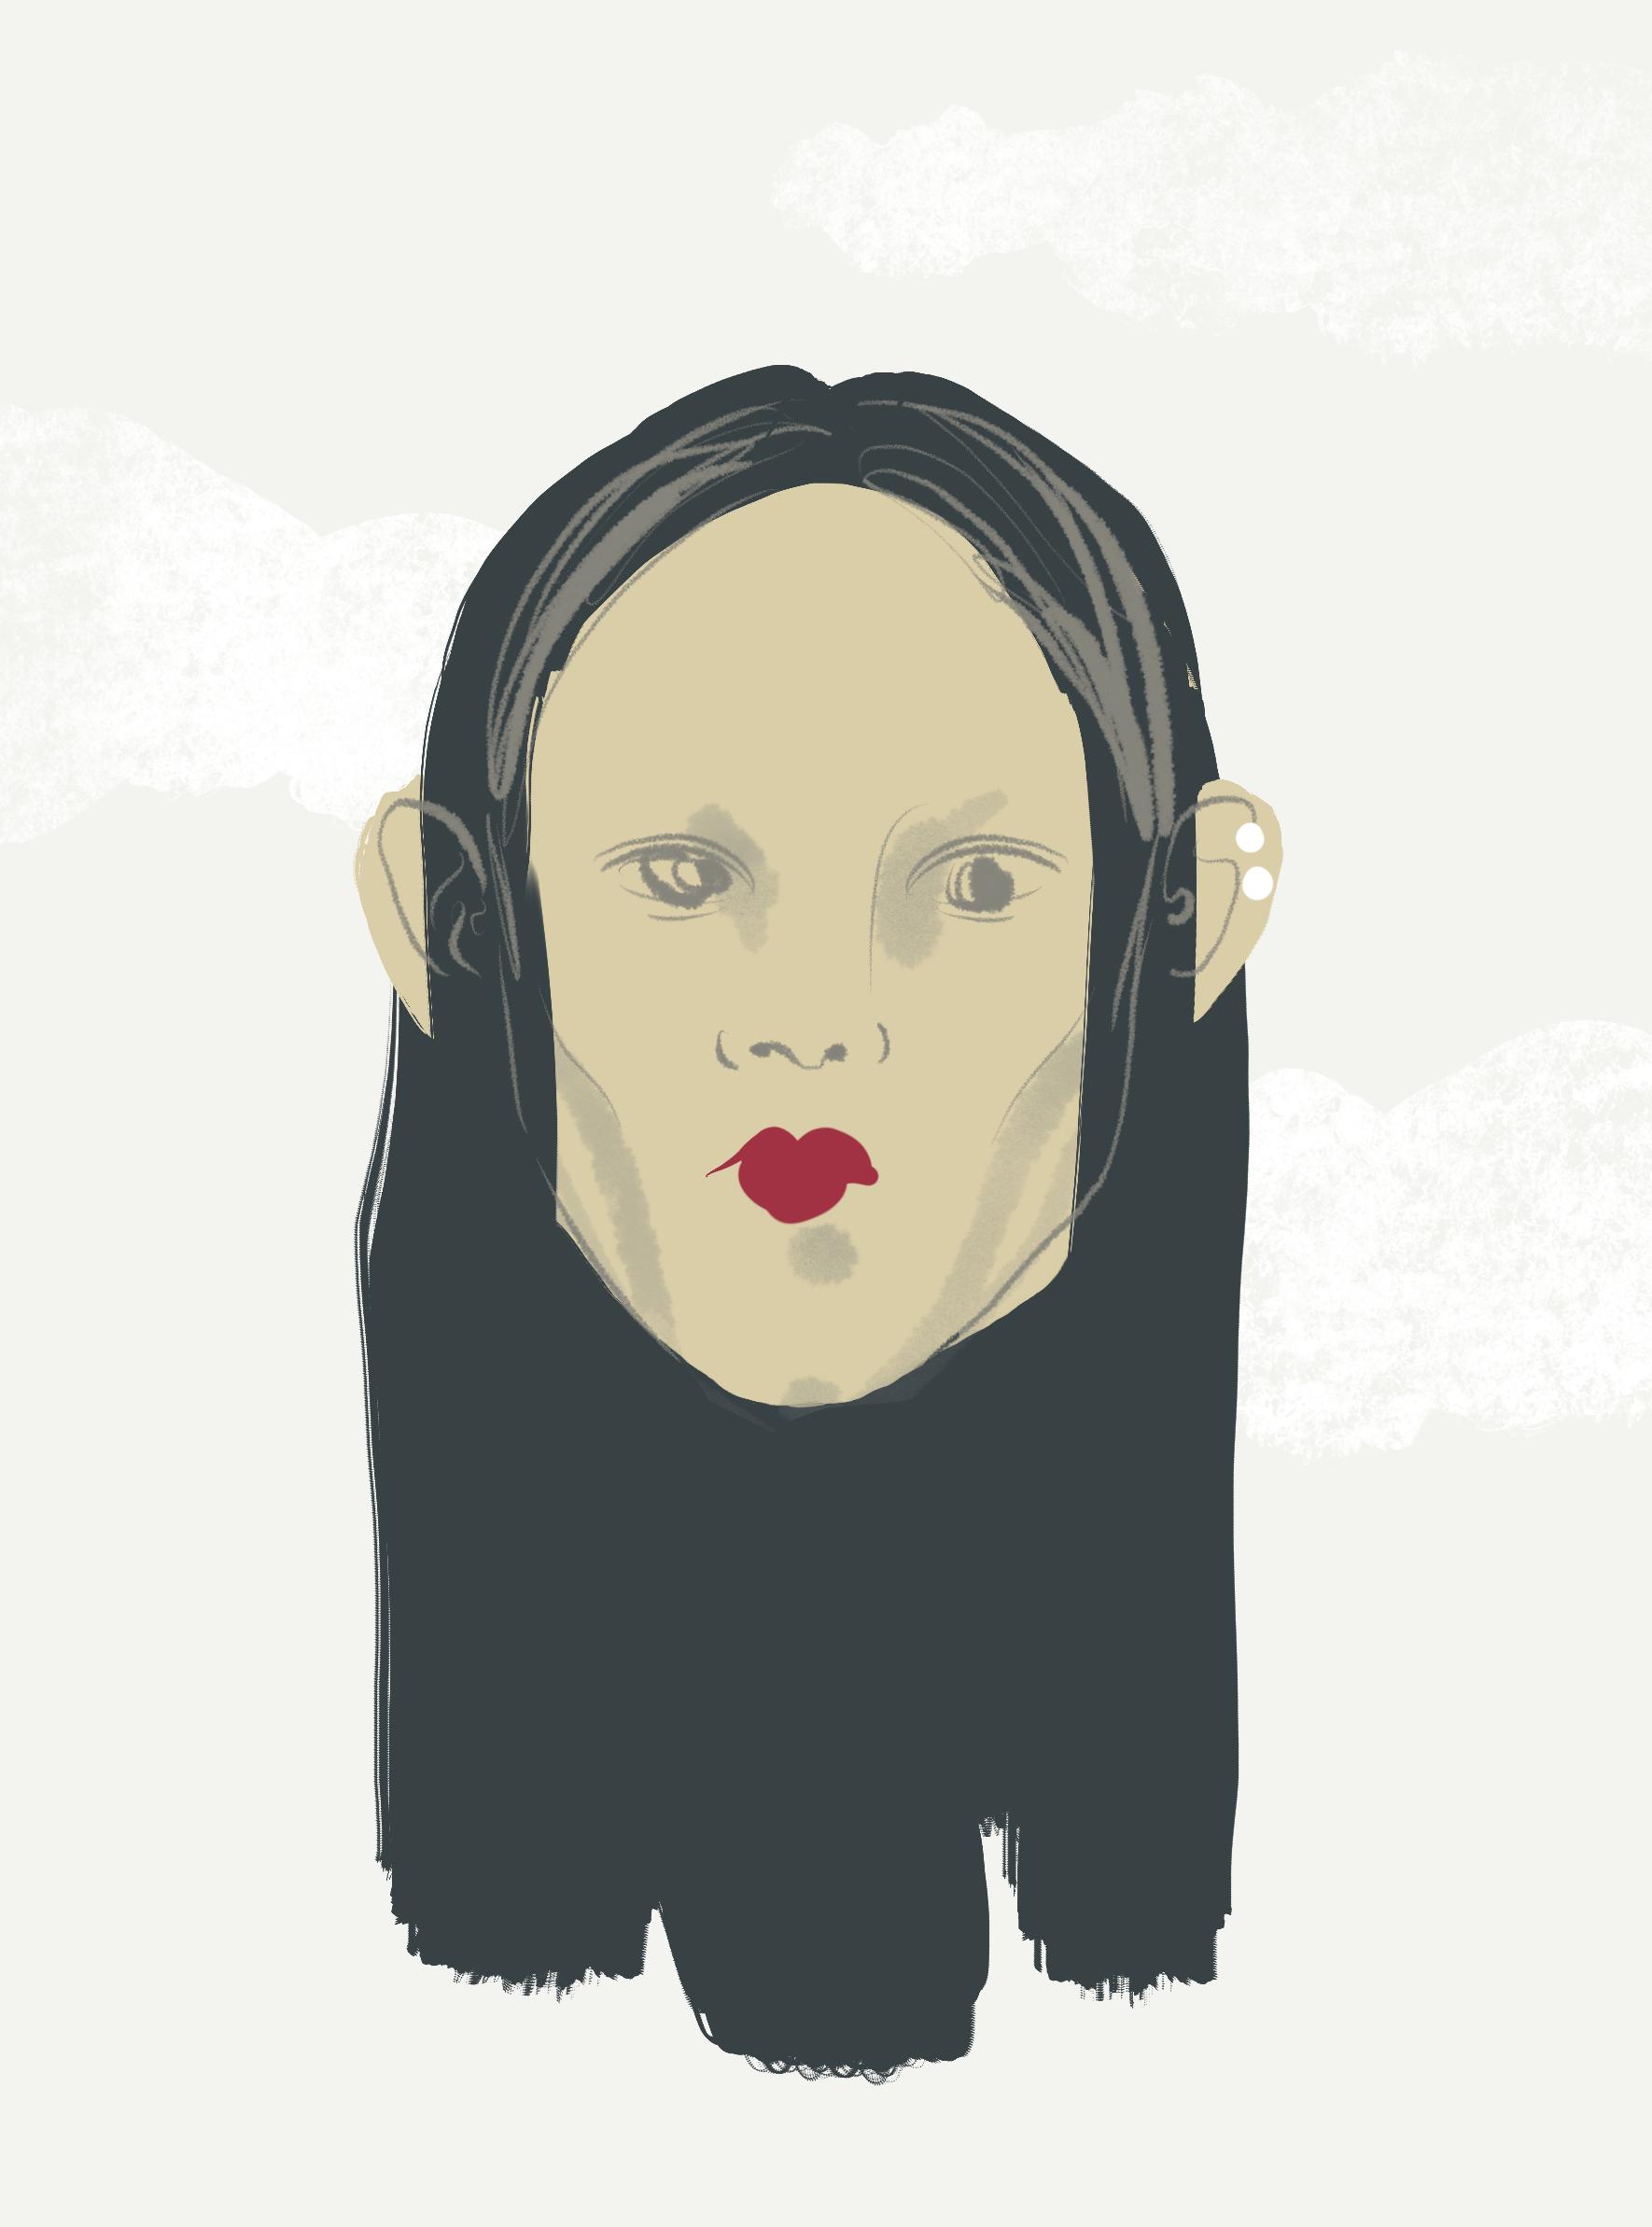 Pearl earrings, illustration by Silvana Mariani, 2021